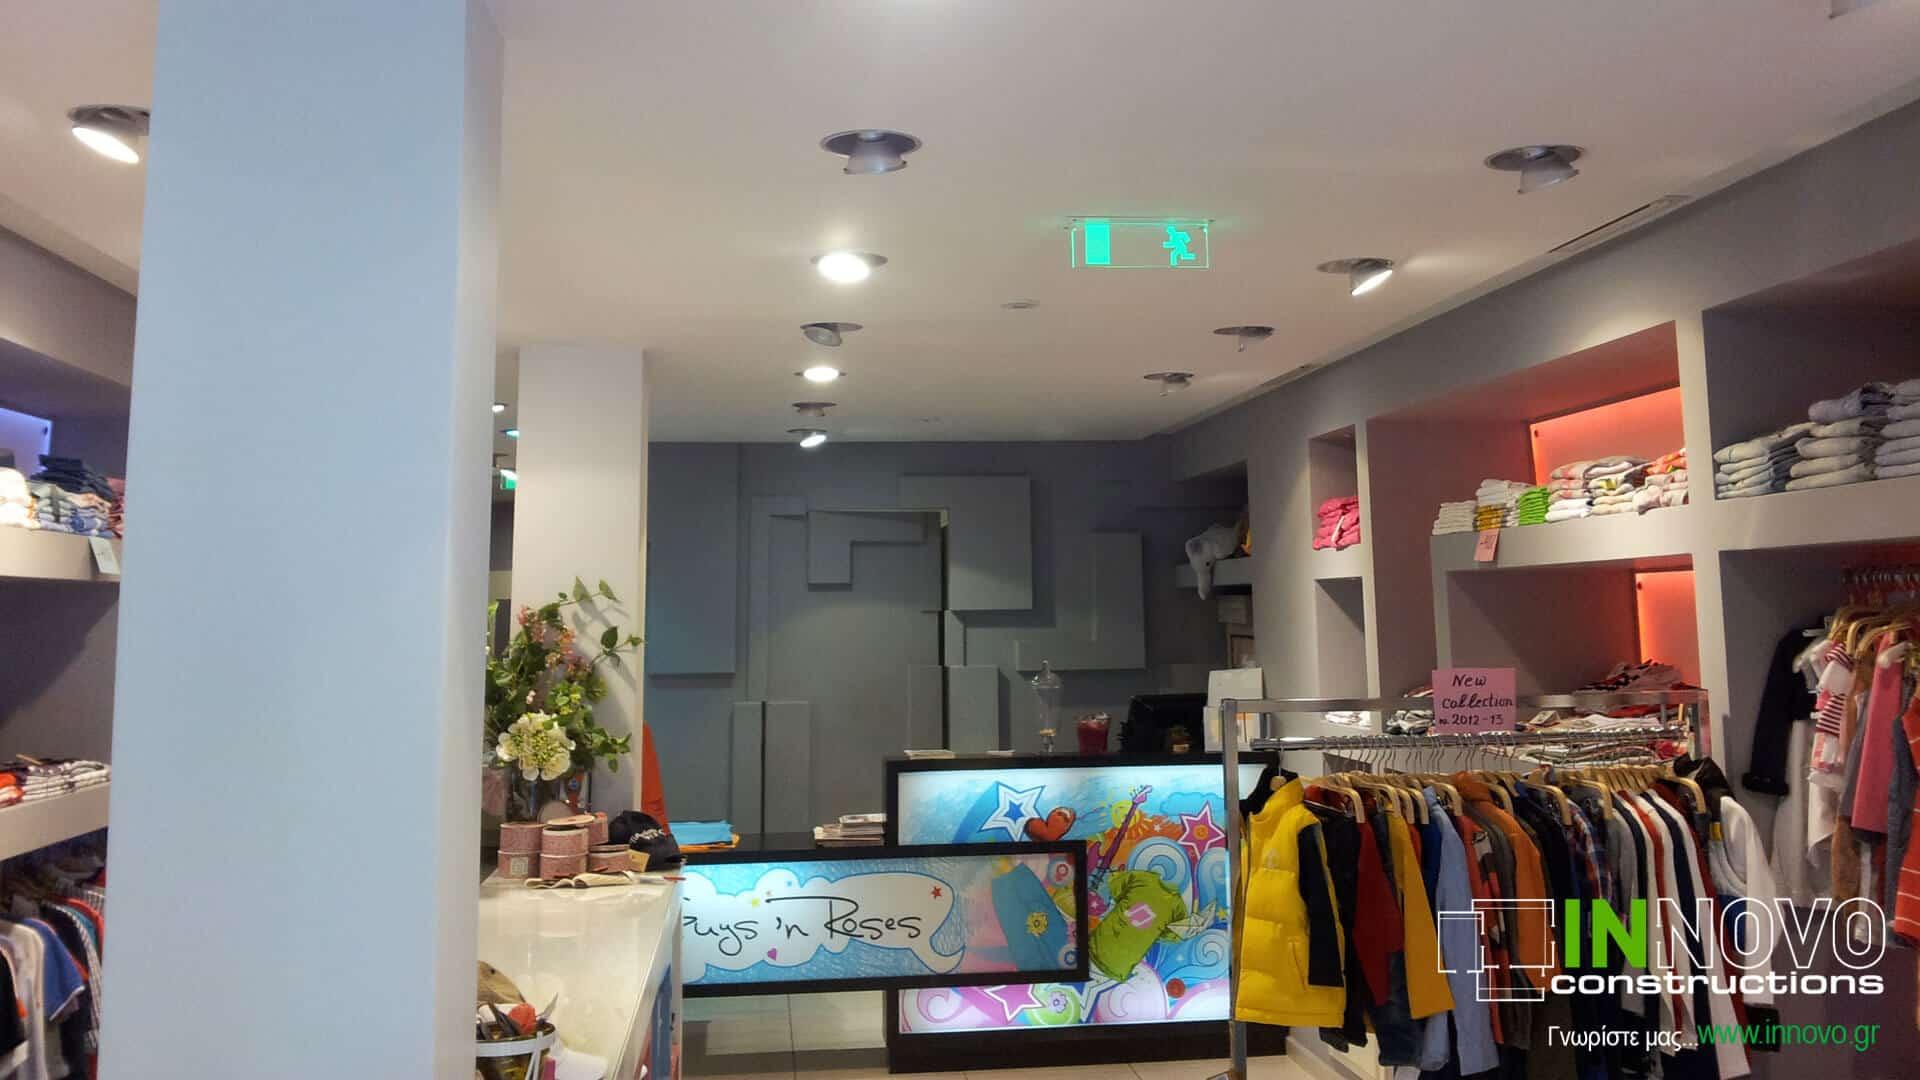 anakainisi-katastimatos-store-renovation-paidika-kefalonia-1217-7 (1)